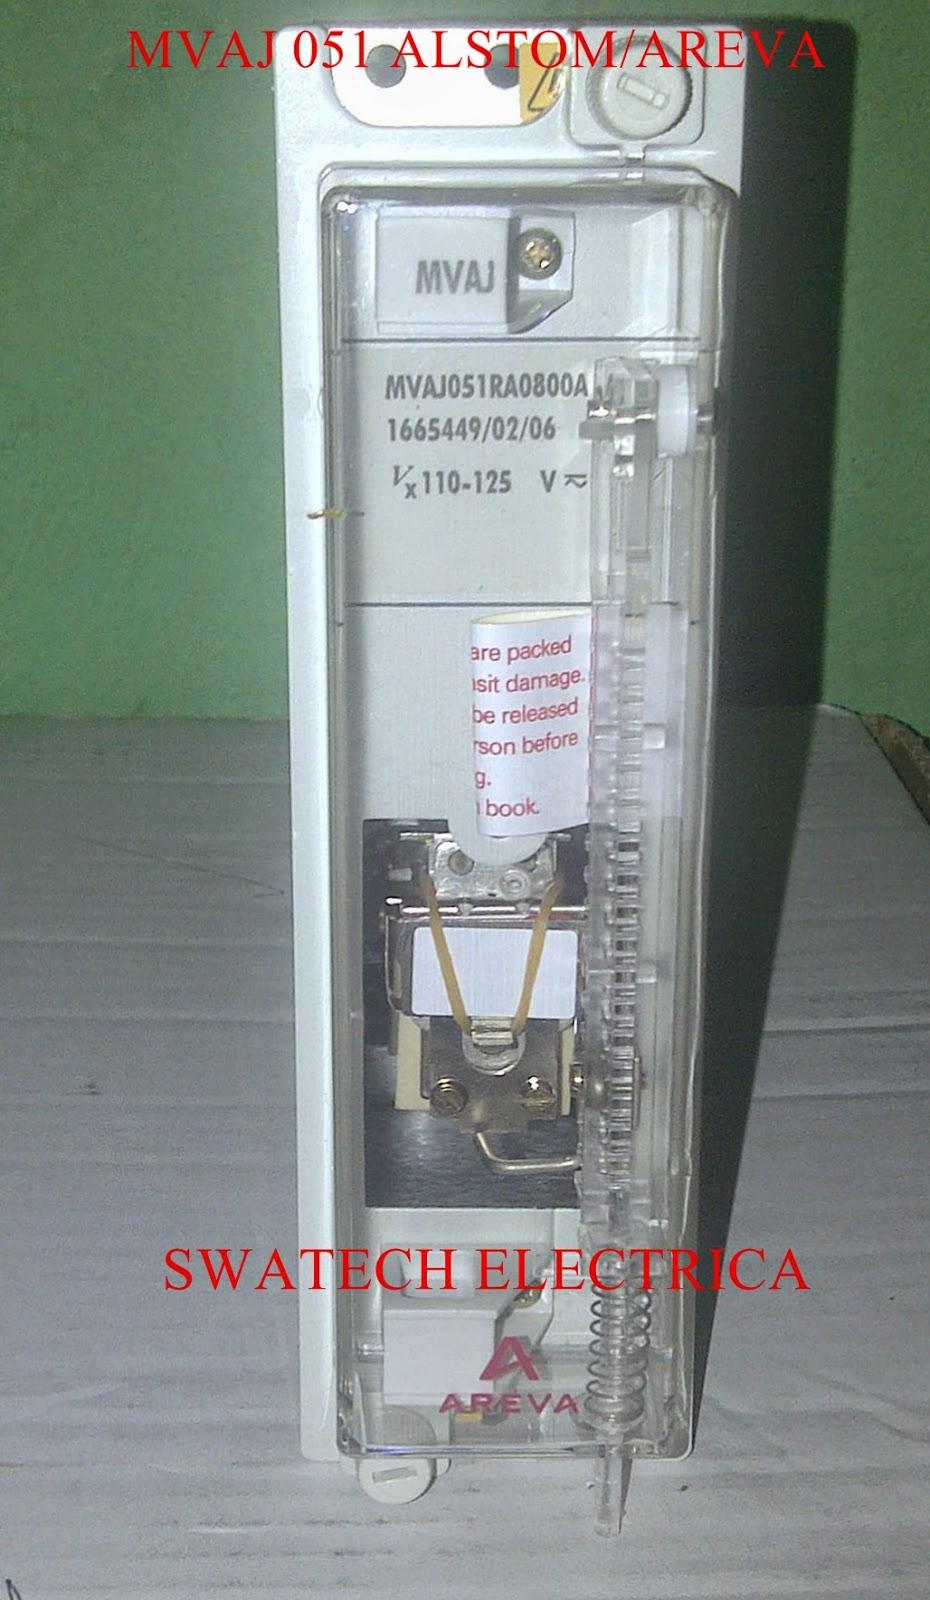 SWATECH ELECTRICA  Jualsell MVTU KMVAJ B MVAJ MVAA - Alstom electromagnetic relay catalogue